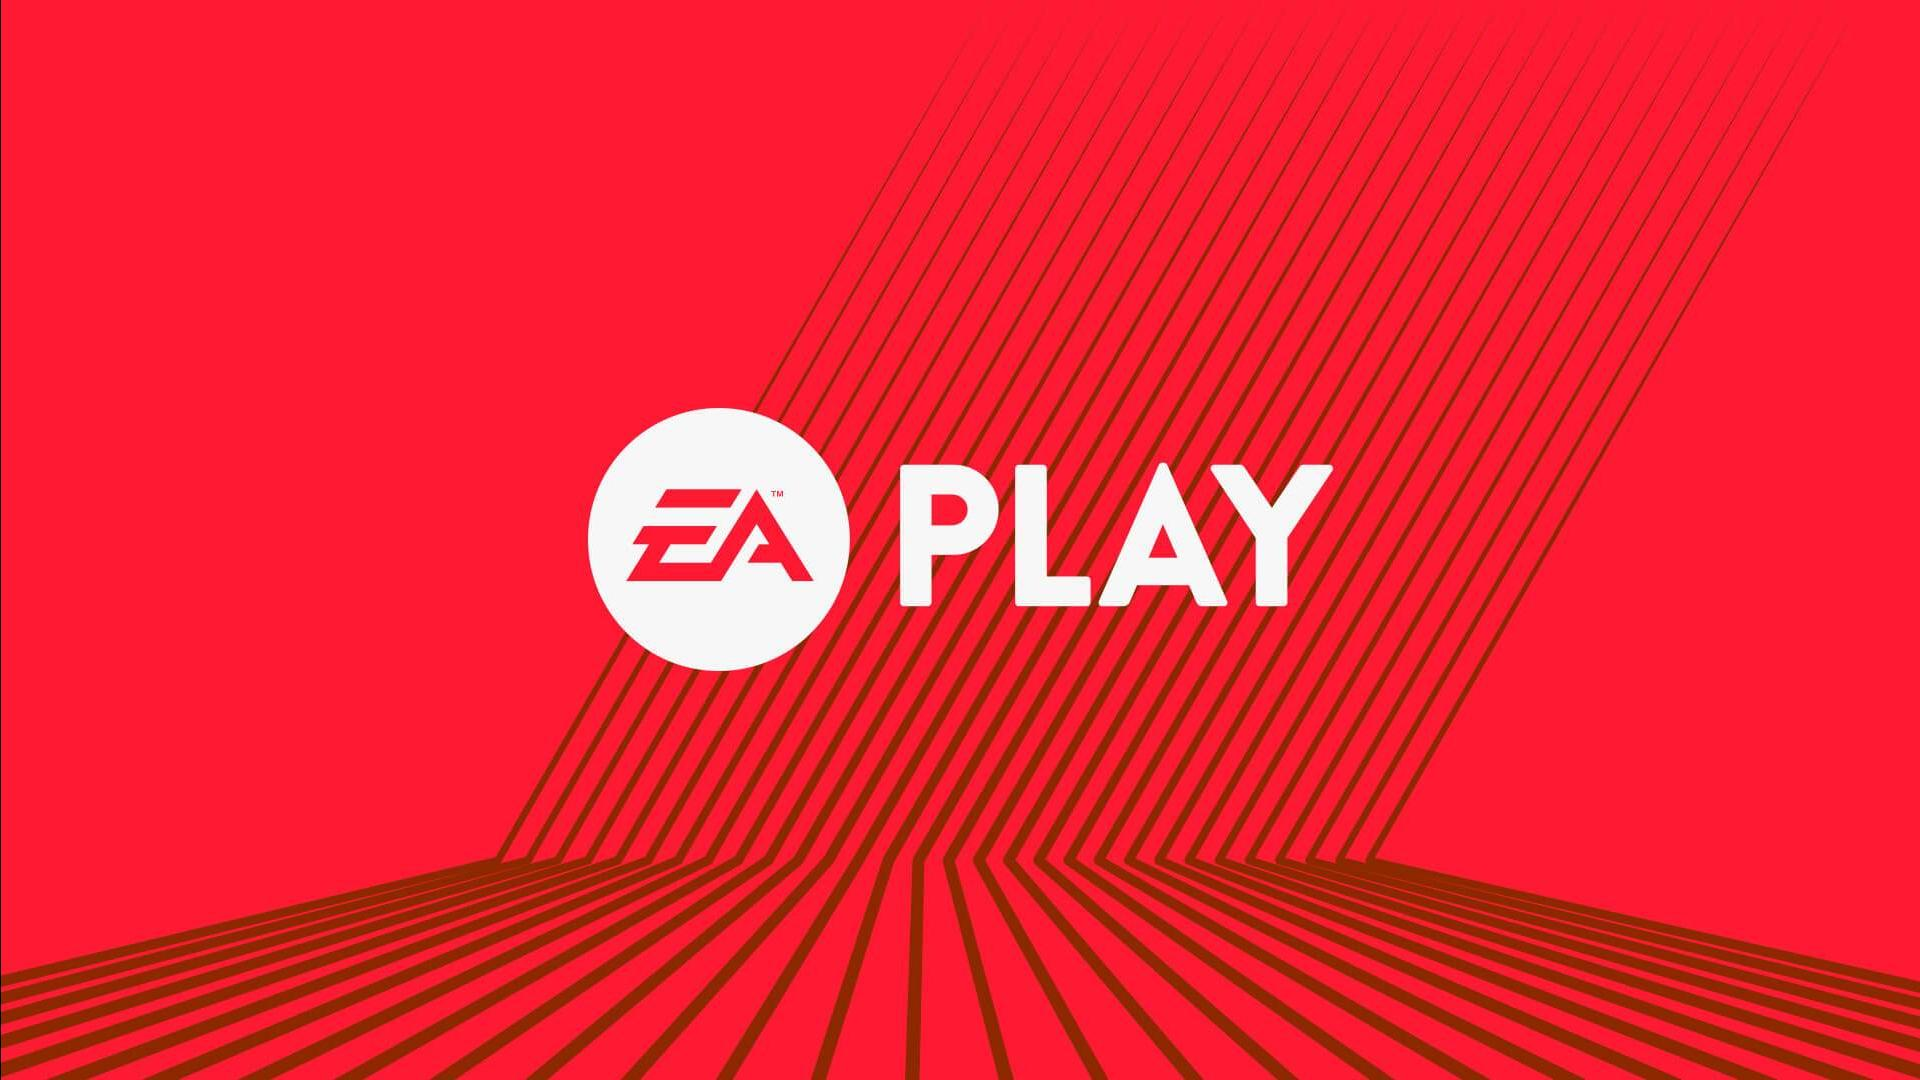 [#E32018] EA Play: impresiones generales de GamerFocus